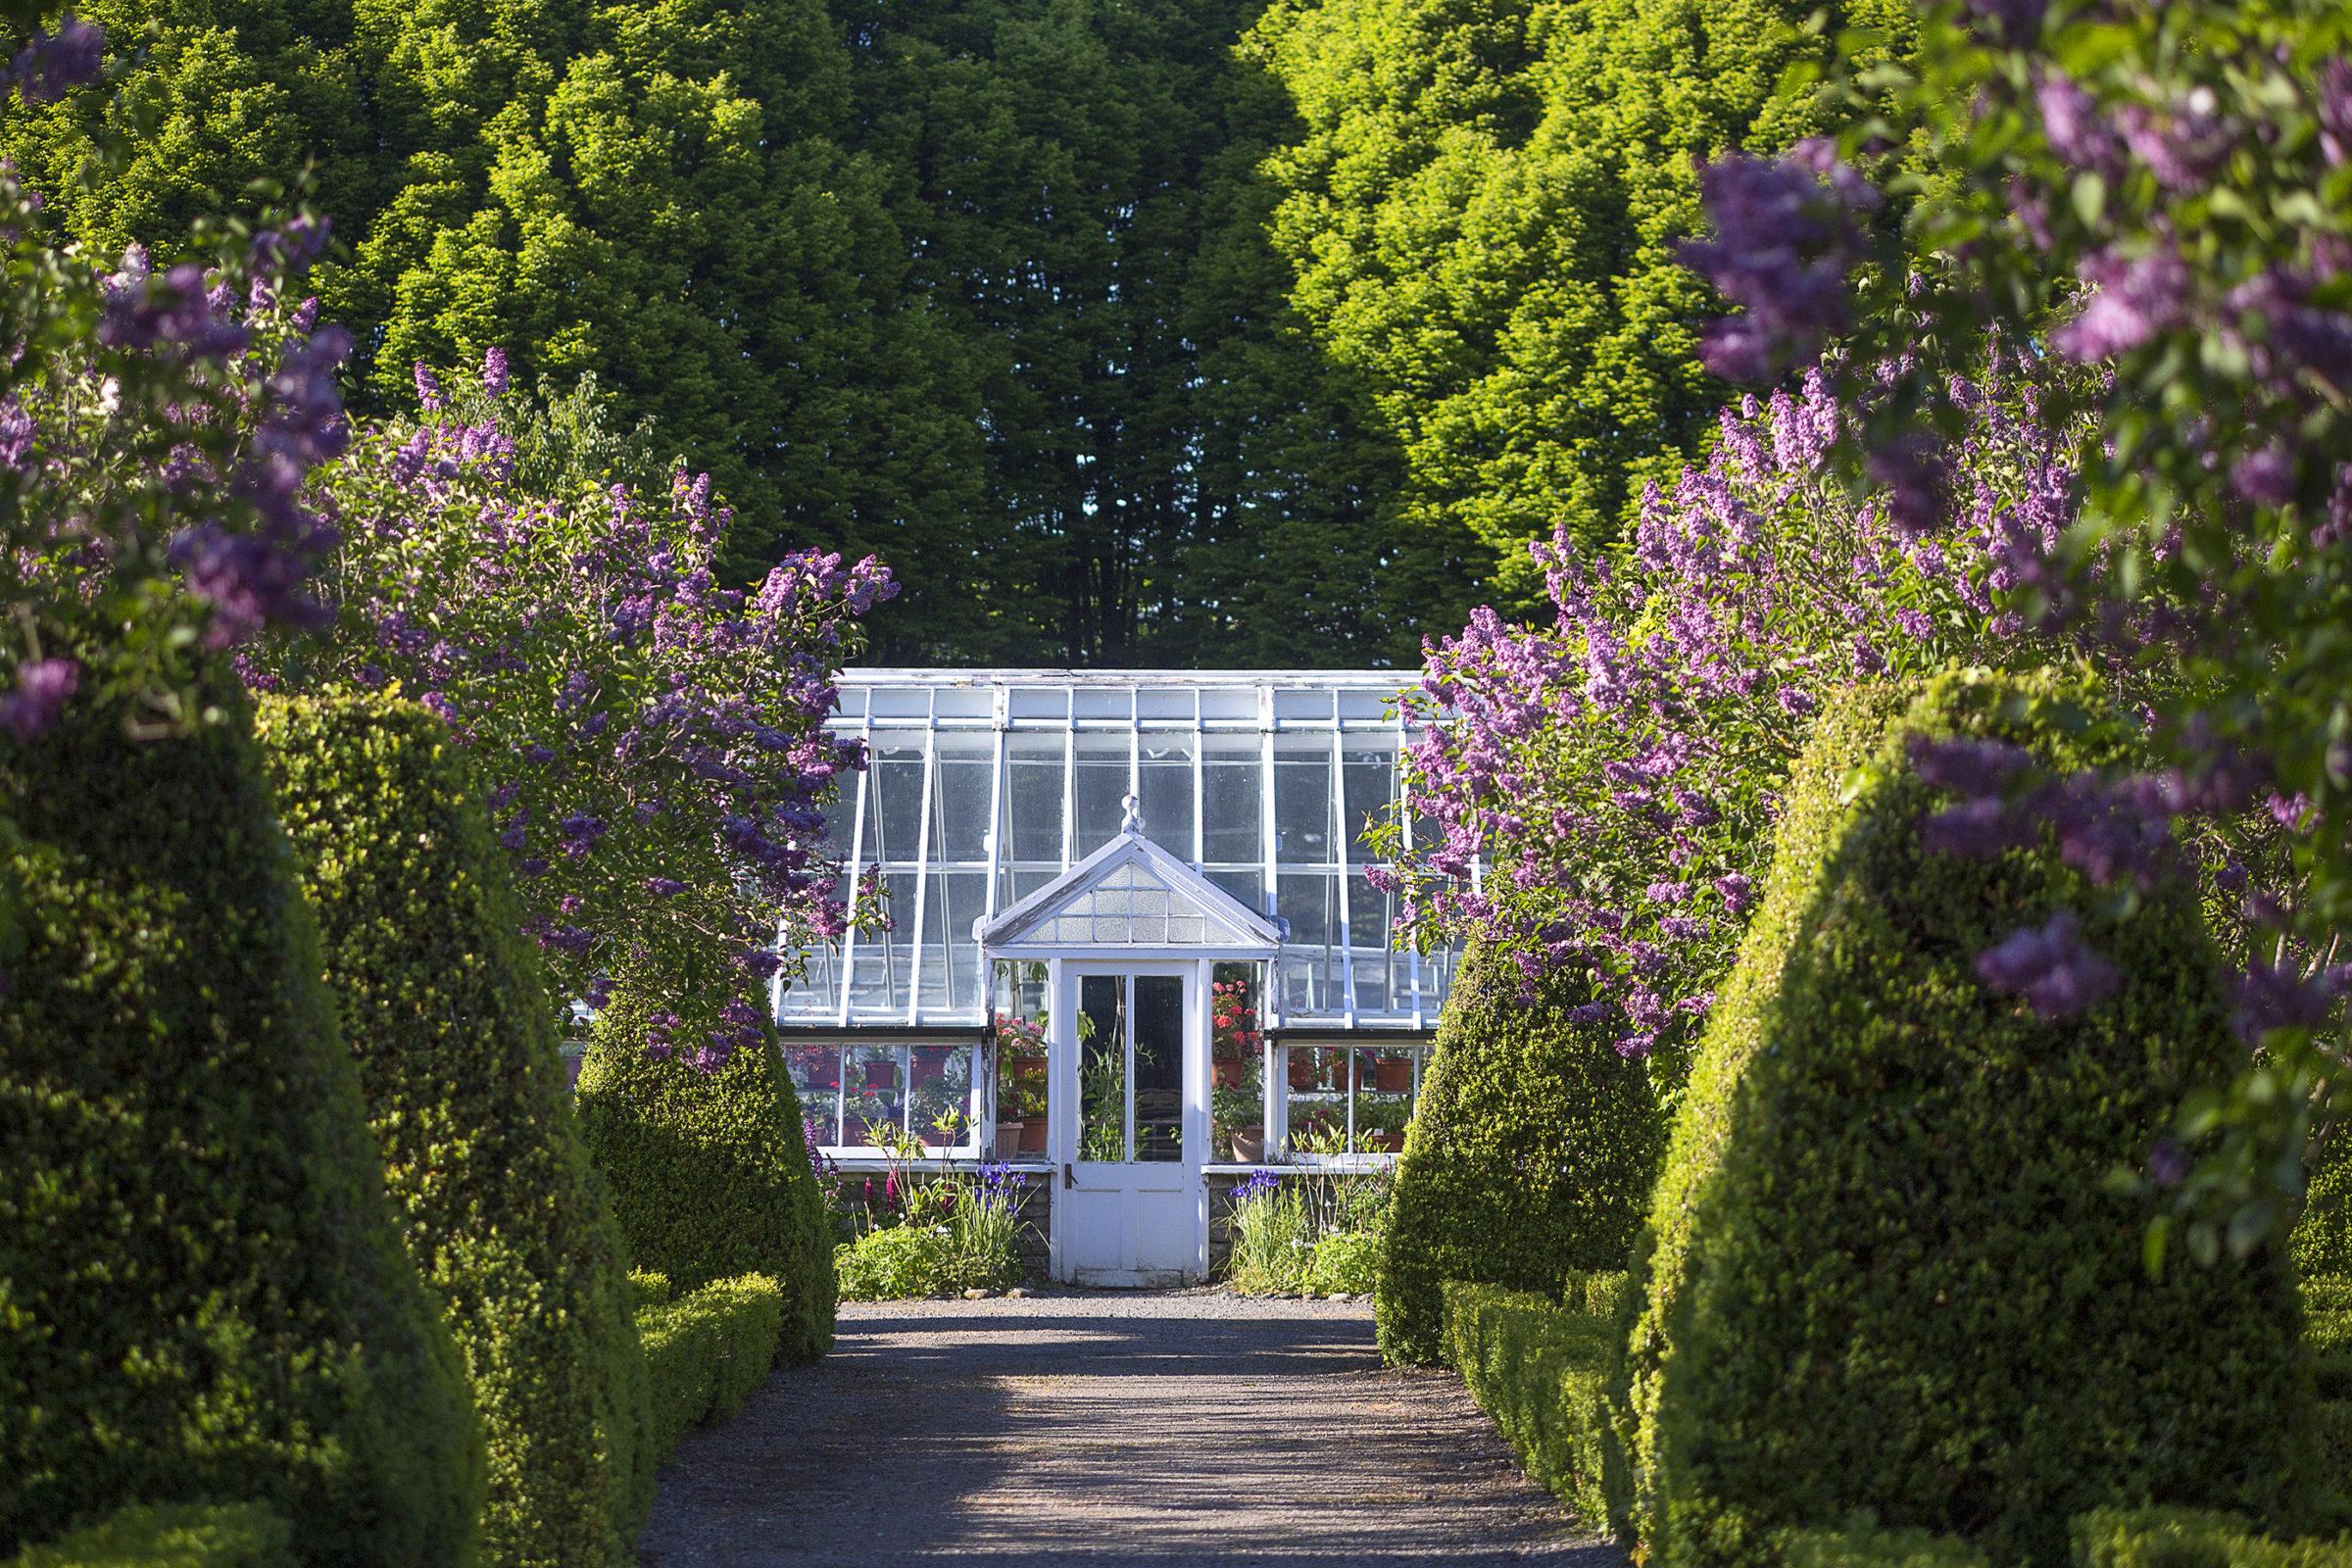 Tina Claffey Birr Castle Gardens to Visit